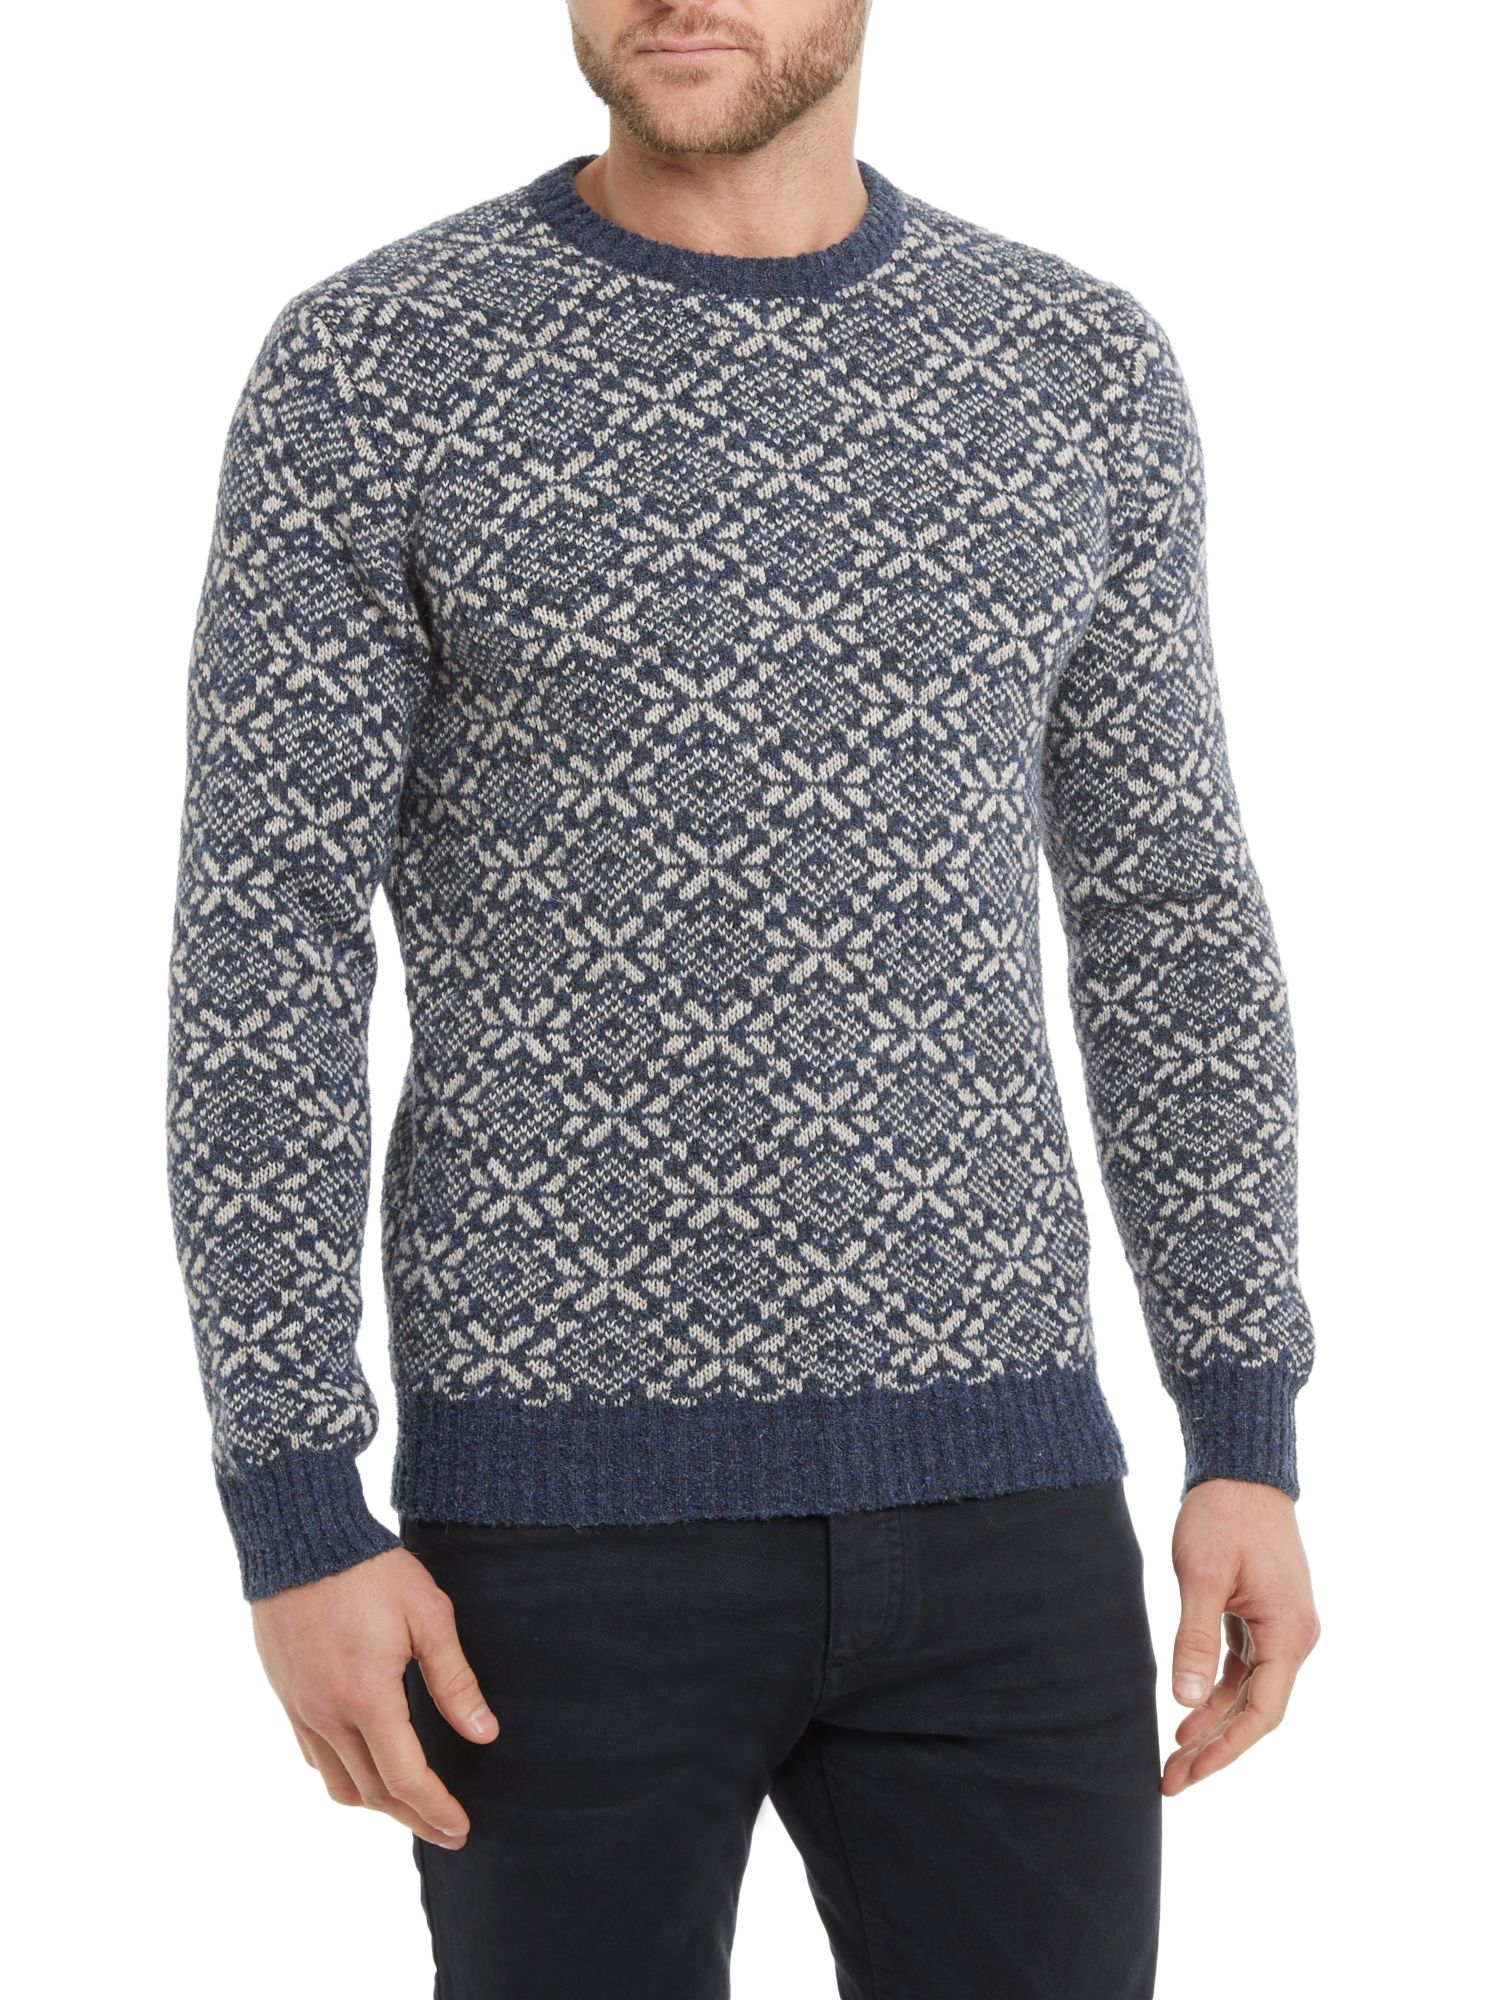 Customised sweatshirts with your unique design